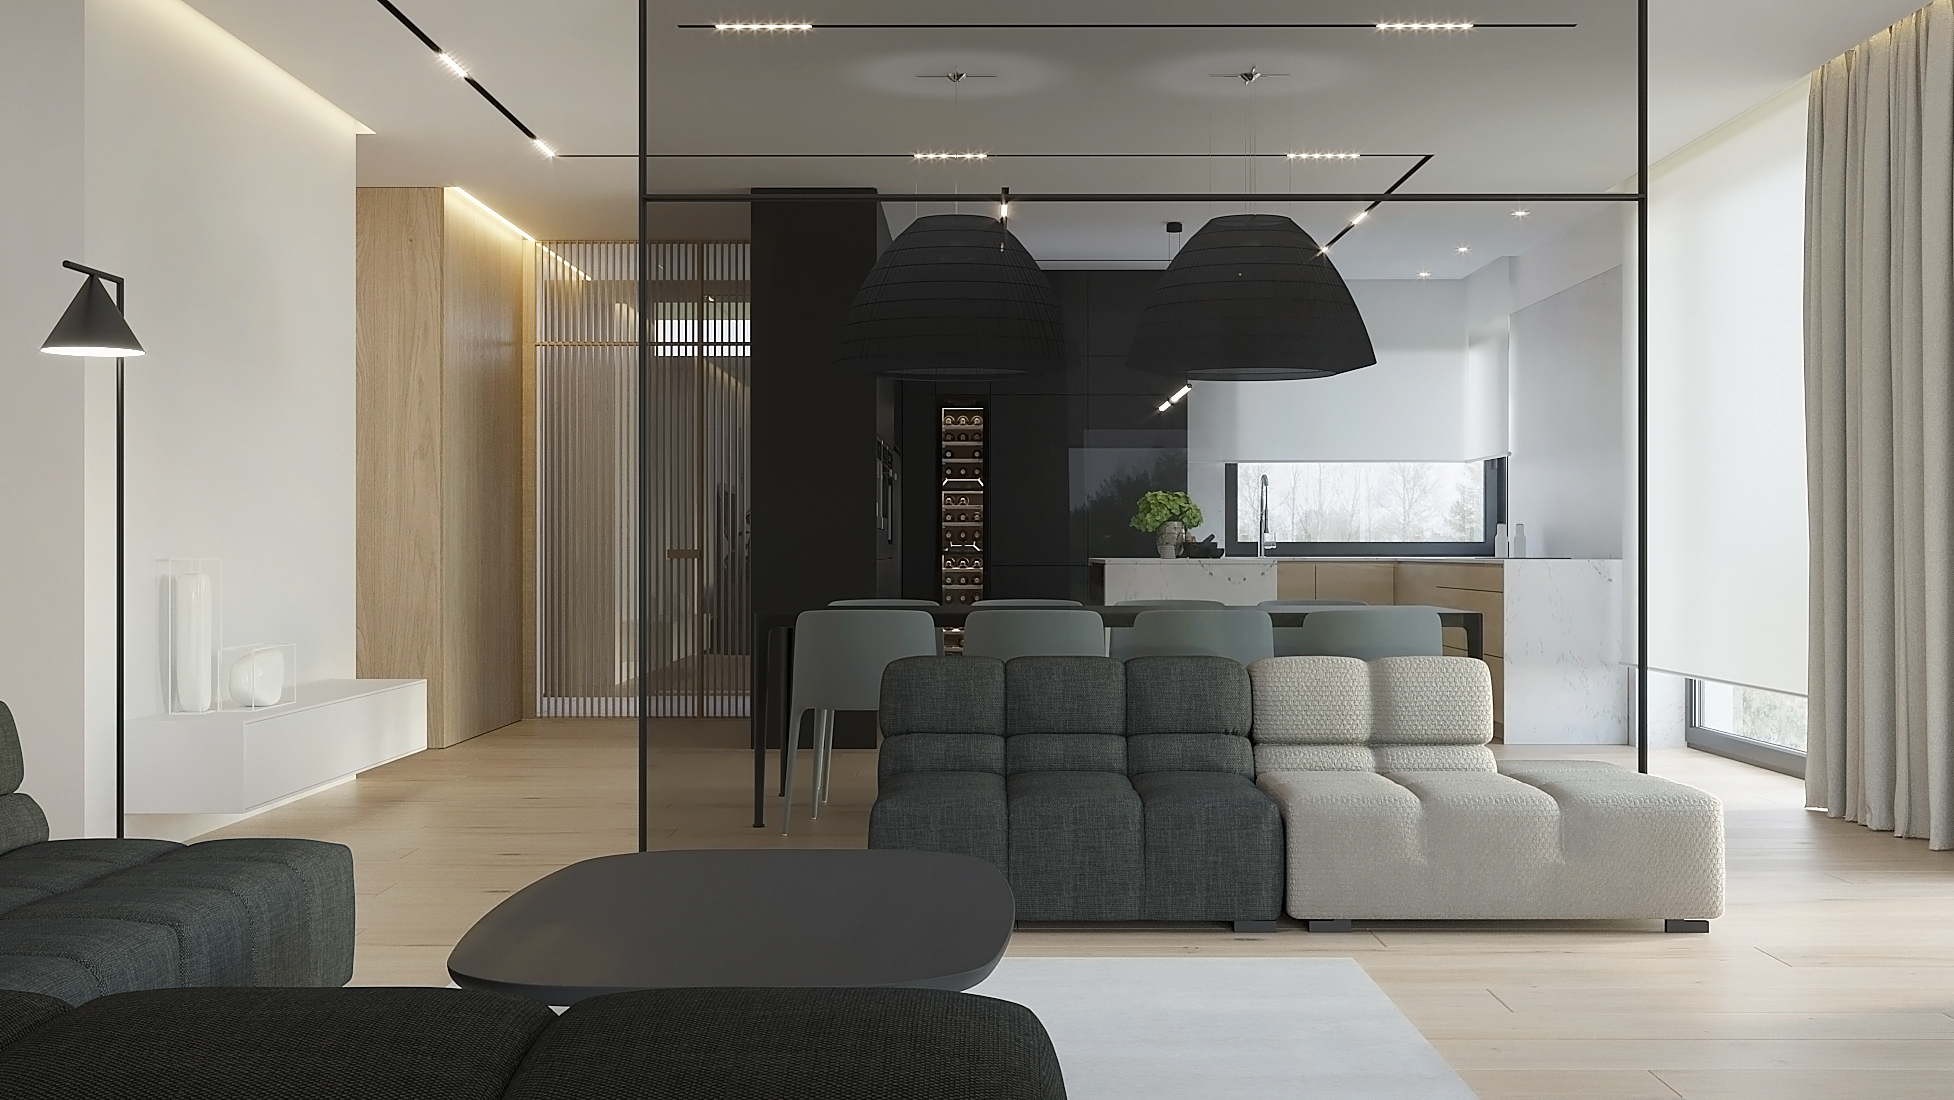 8 projket wnetrz D555 dom Libertow salon sciana szklana sofa pikowana drewniana podloga